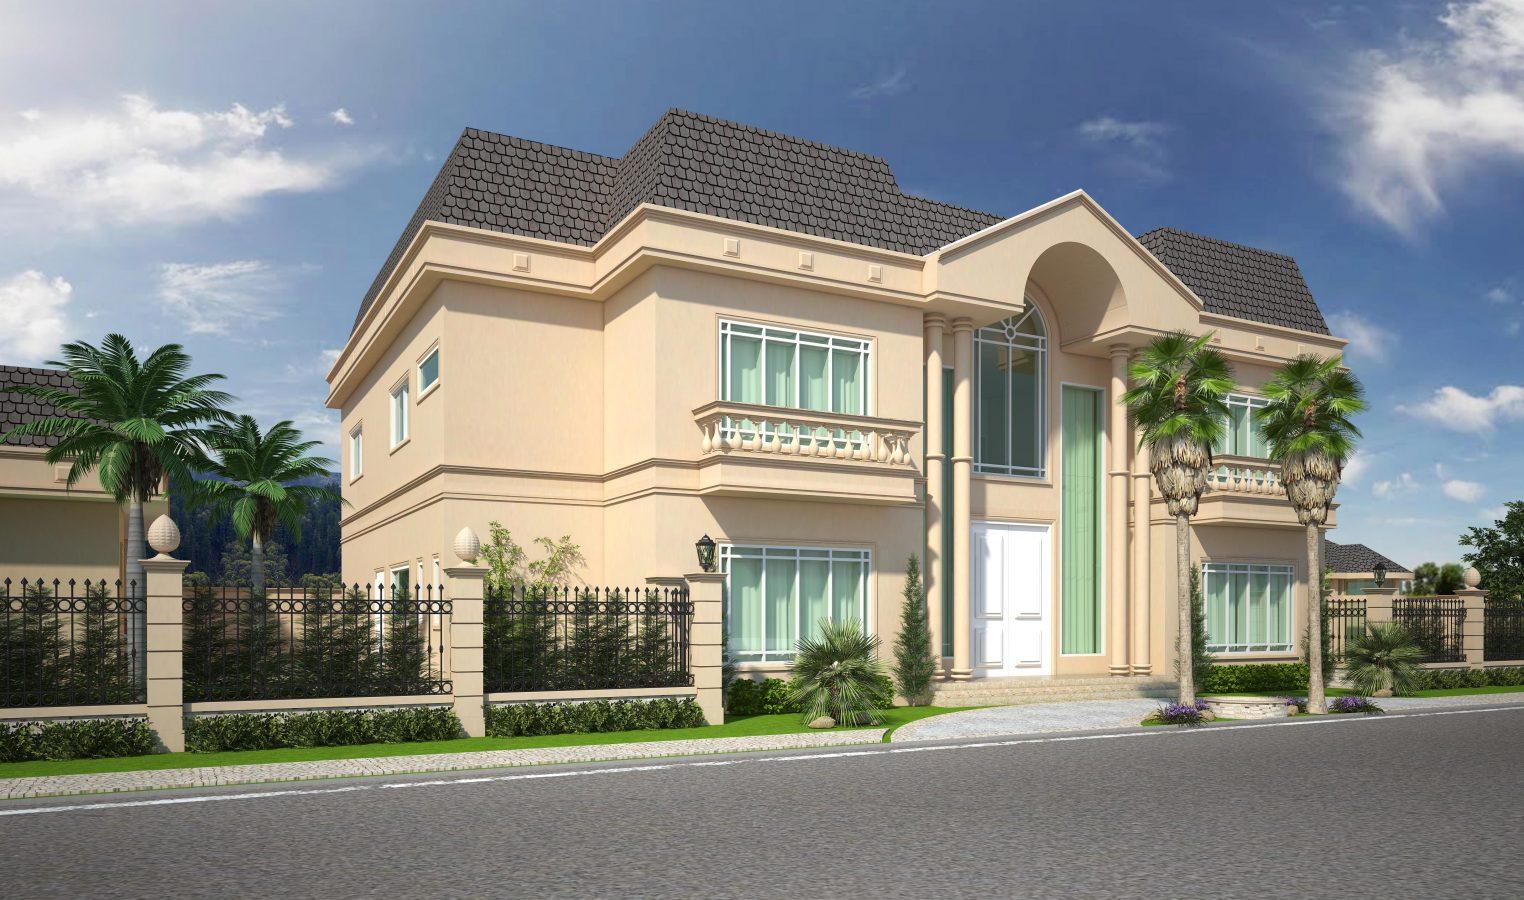 Projetos de casas cl ssicas com estilo americana e for Casa classica villa medici